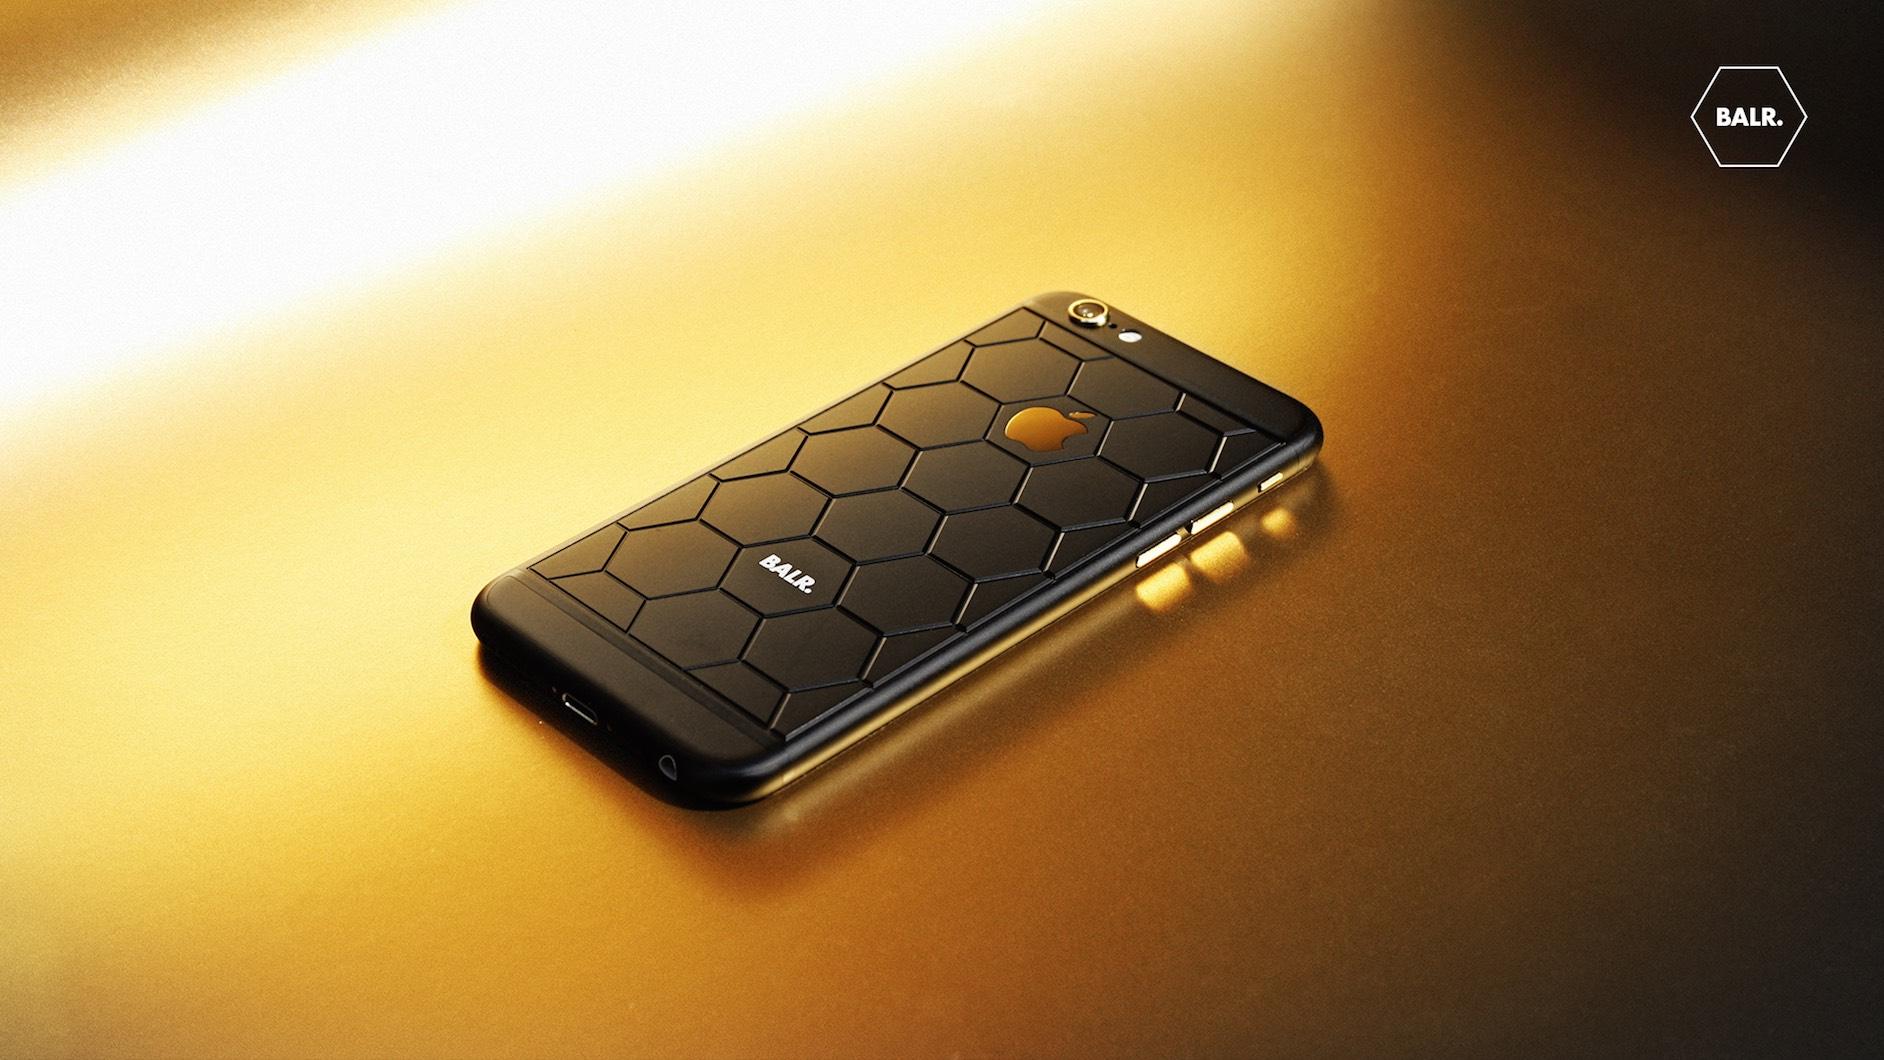 win a custom balr iphone 6 433